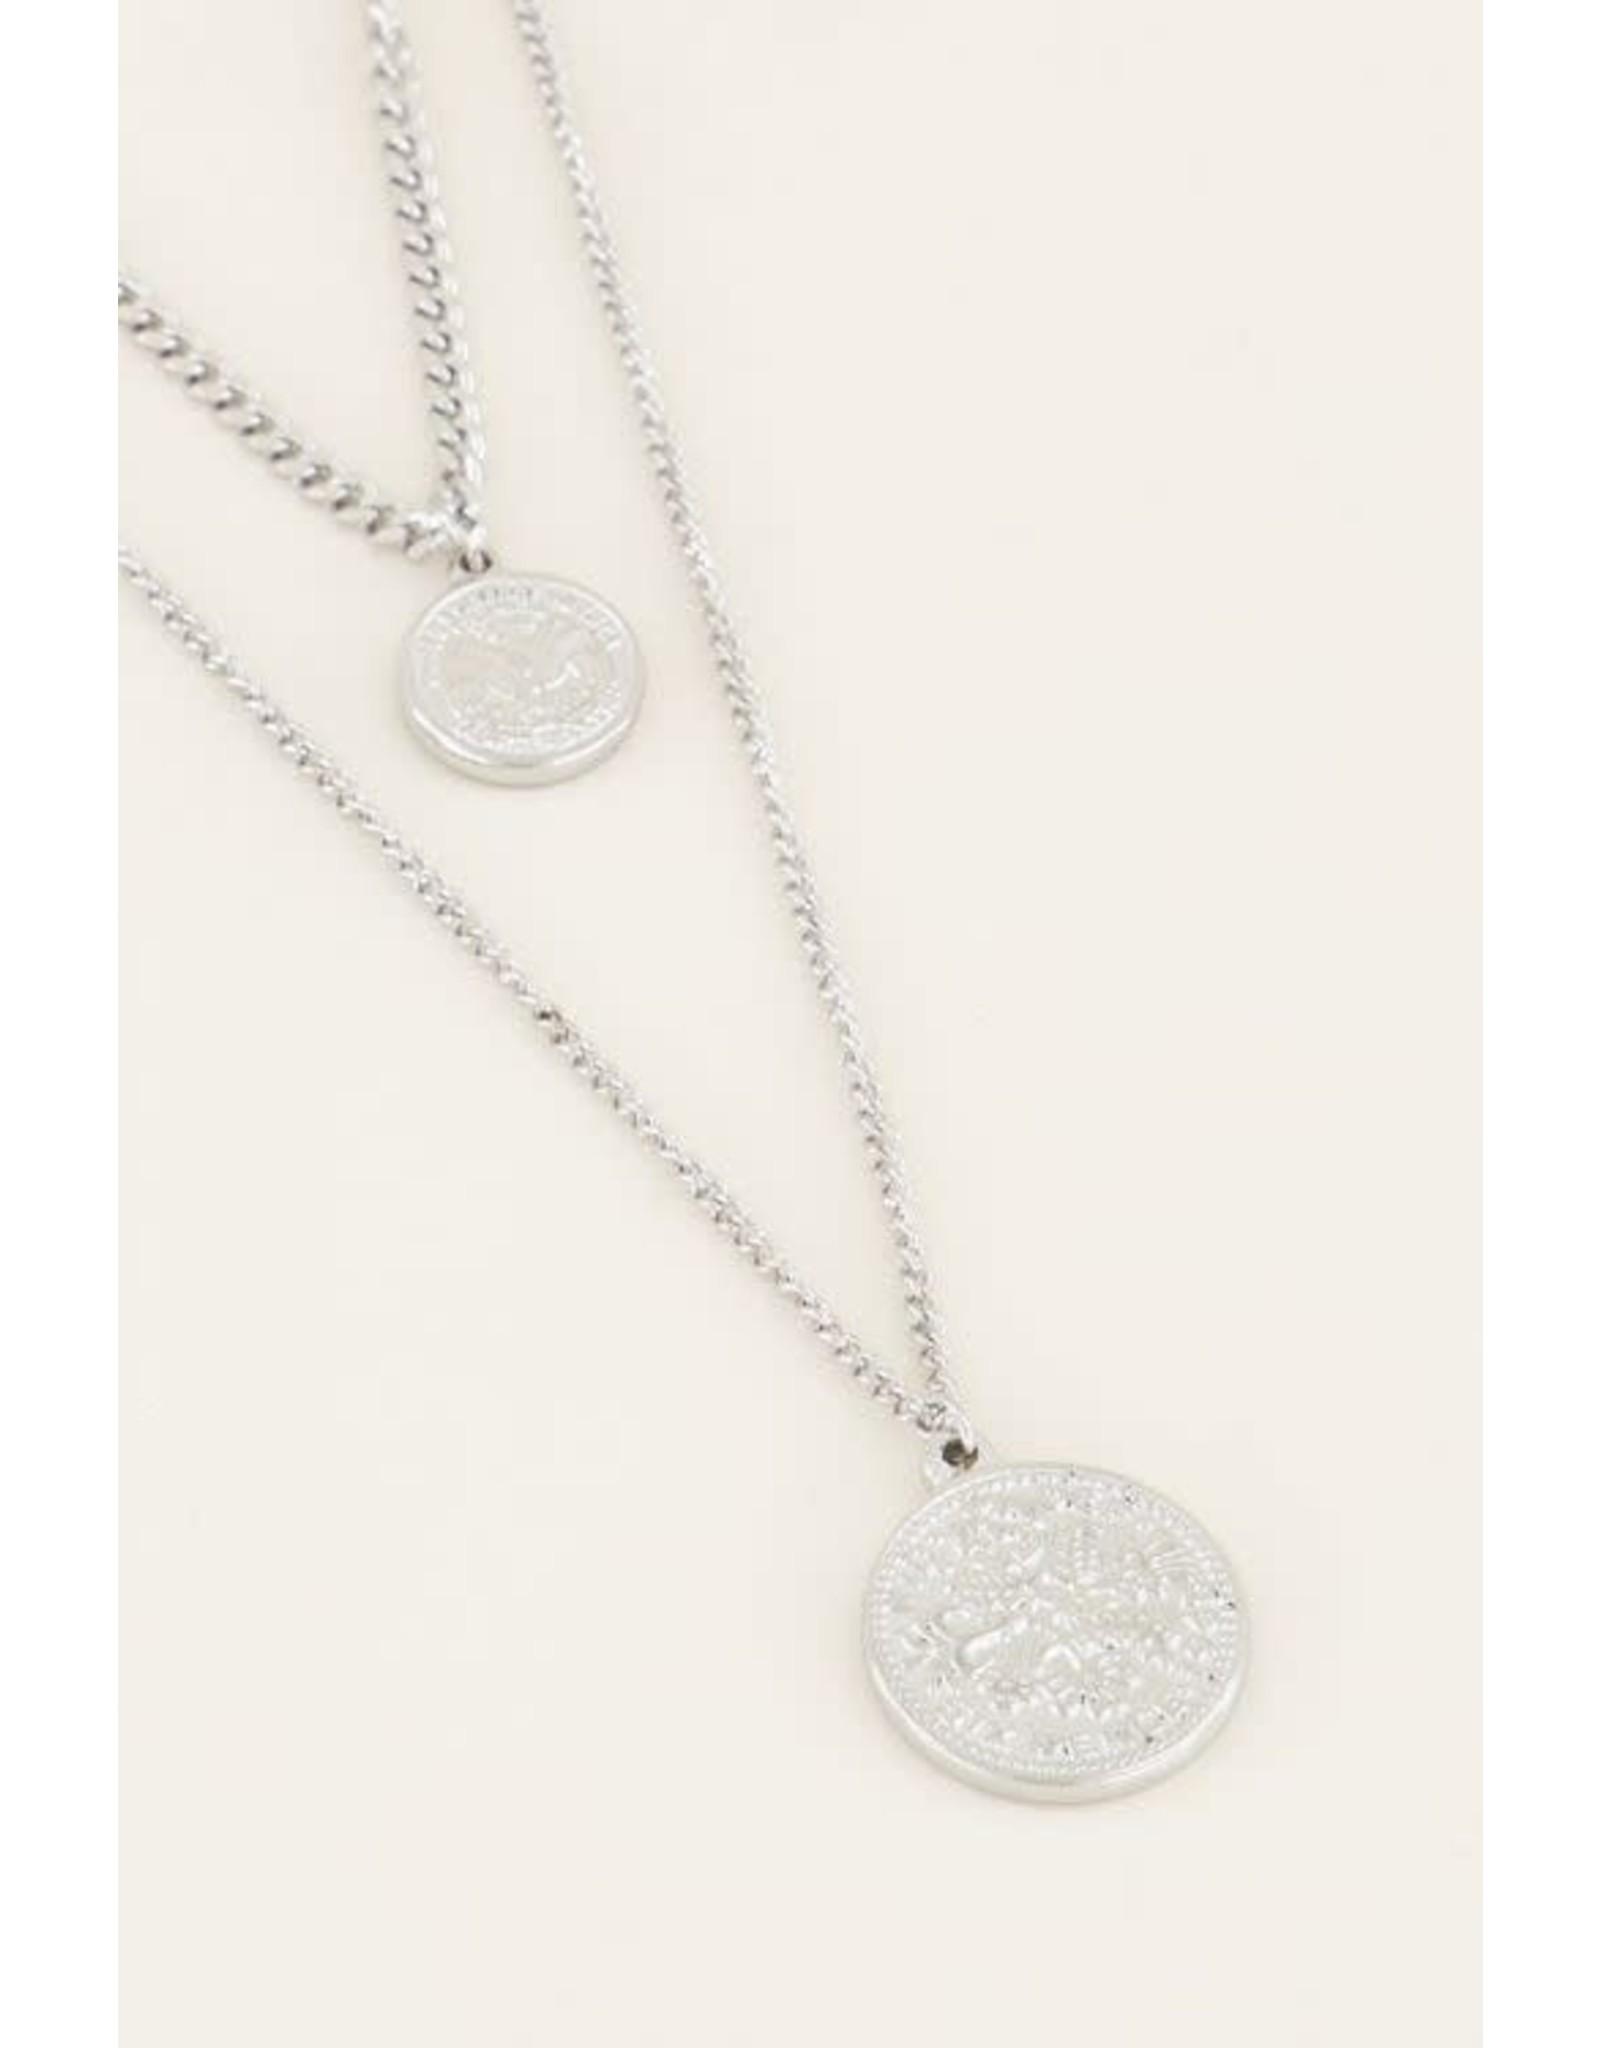 My Jewellery My Jewellery dubbele ketting munt